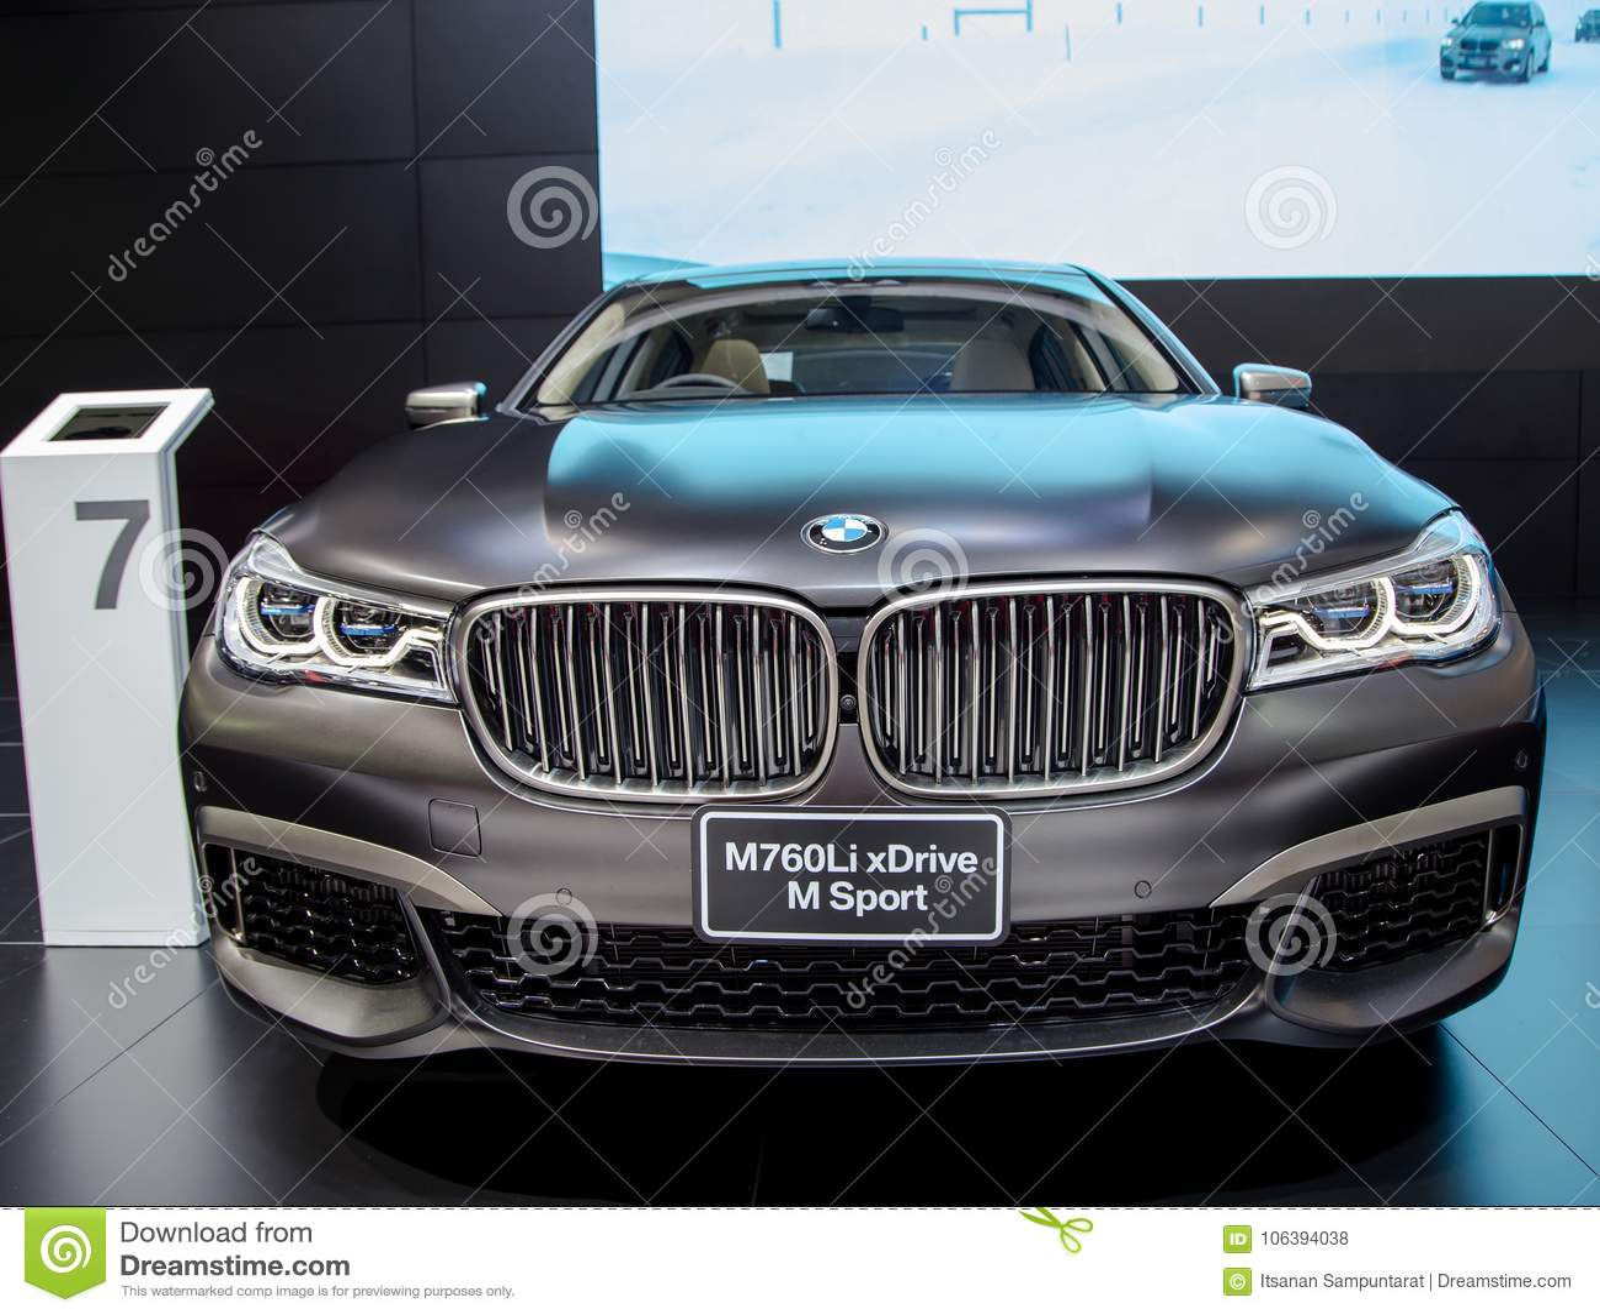 Bmw Xdrive M Sport